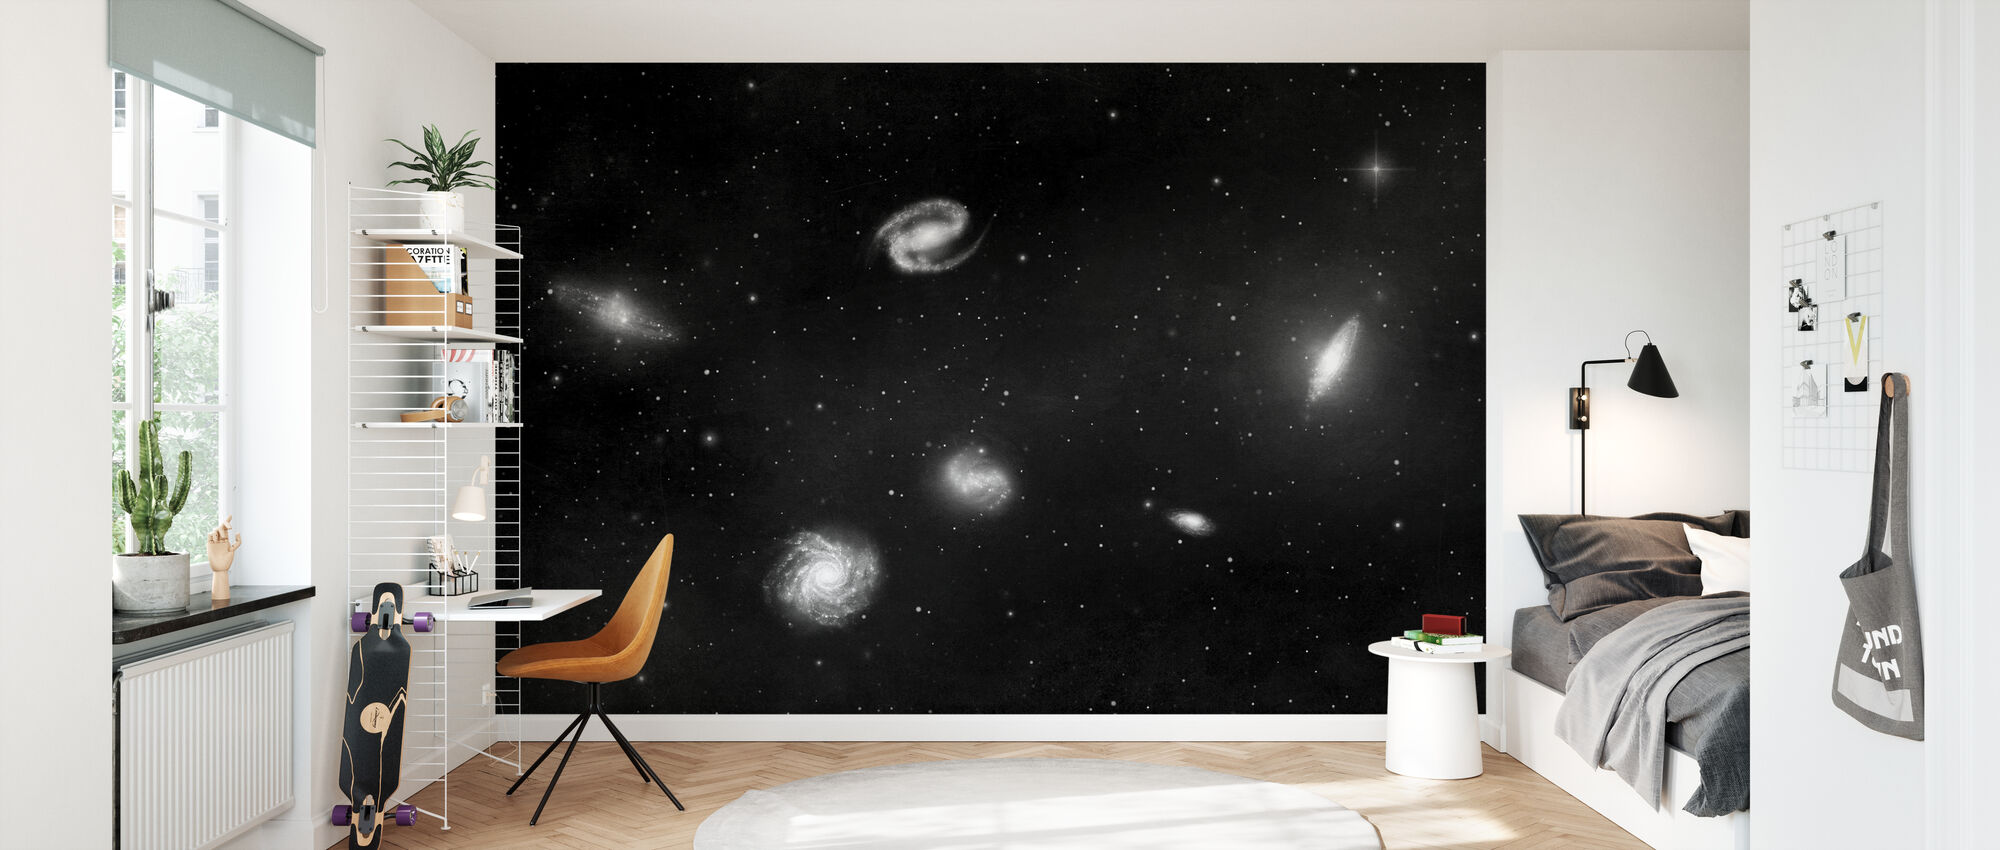 Darkest Dark - Galaxies Mono - Wallpaper - Kids Room